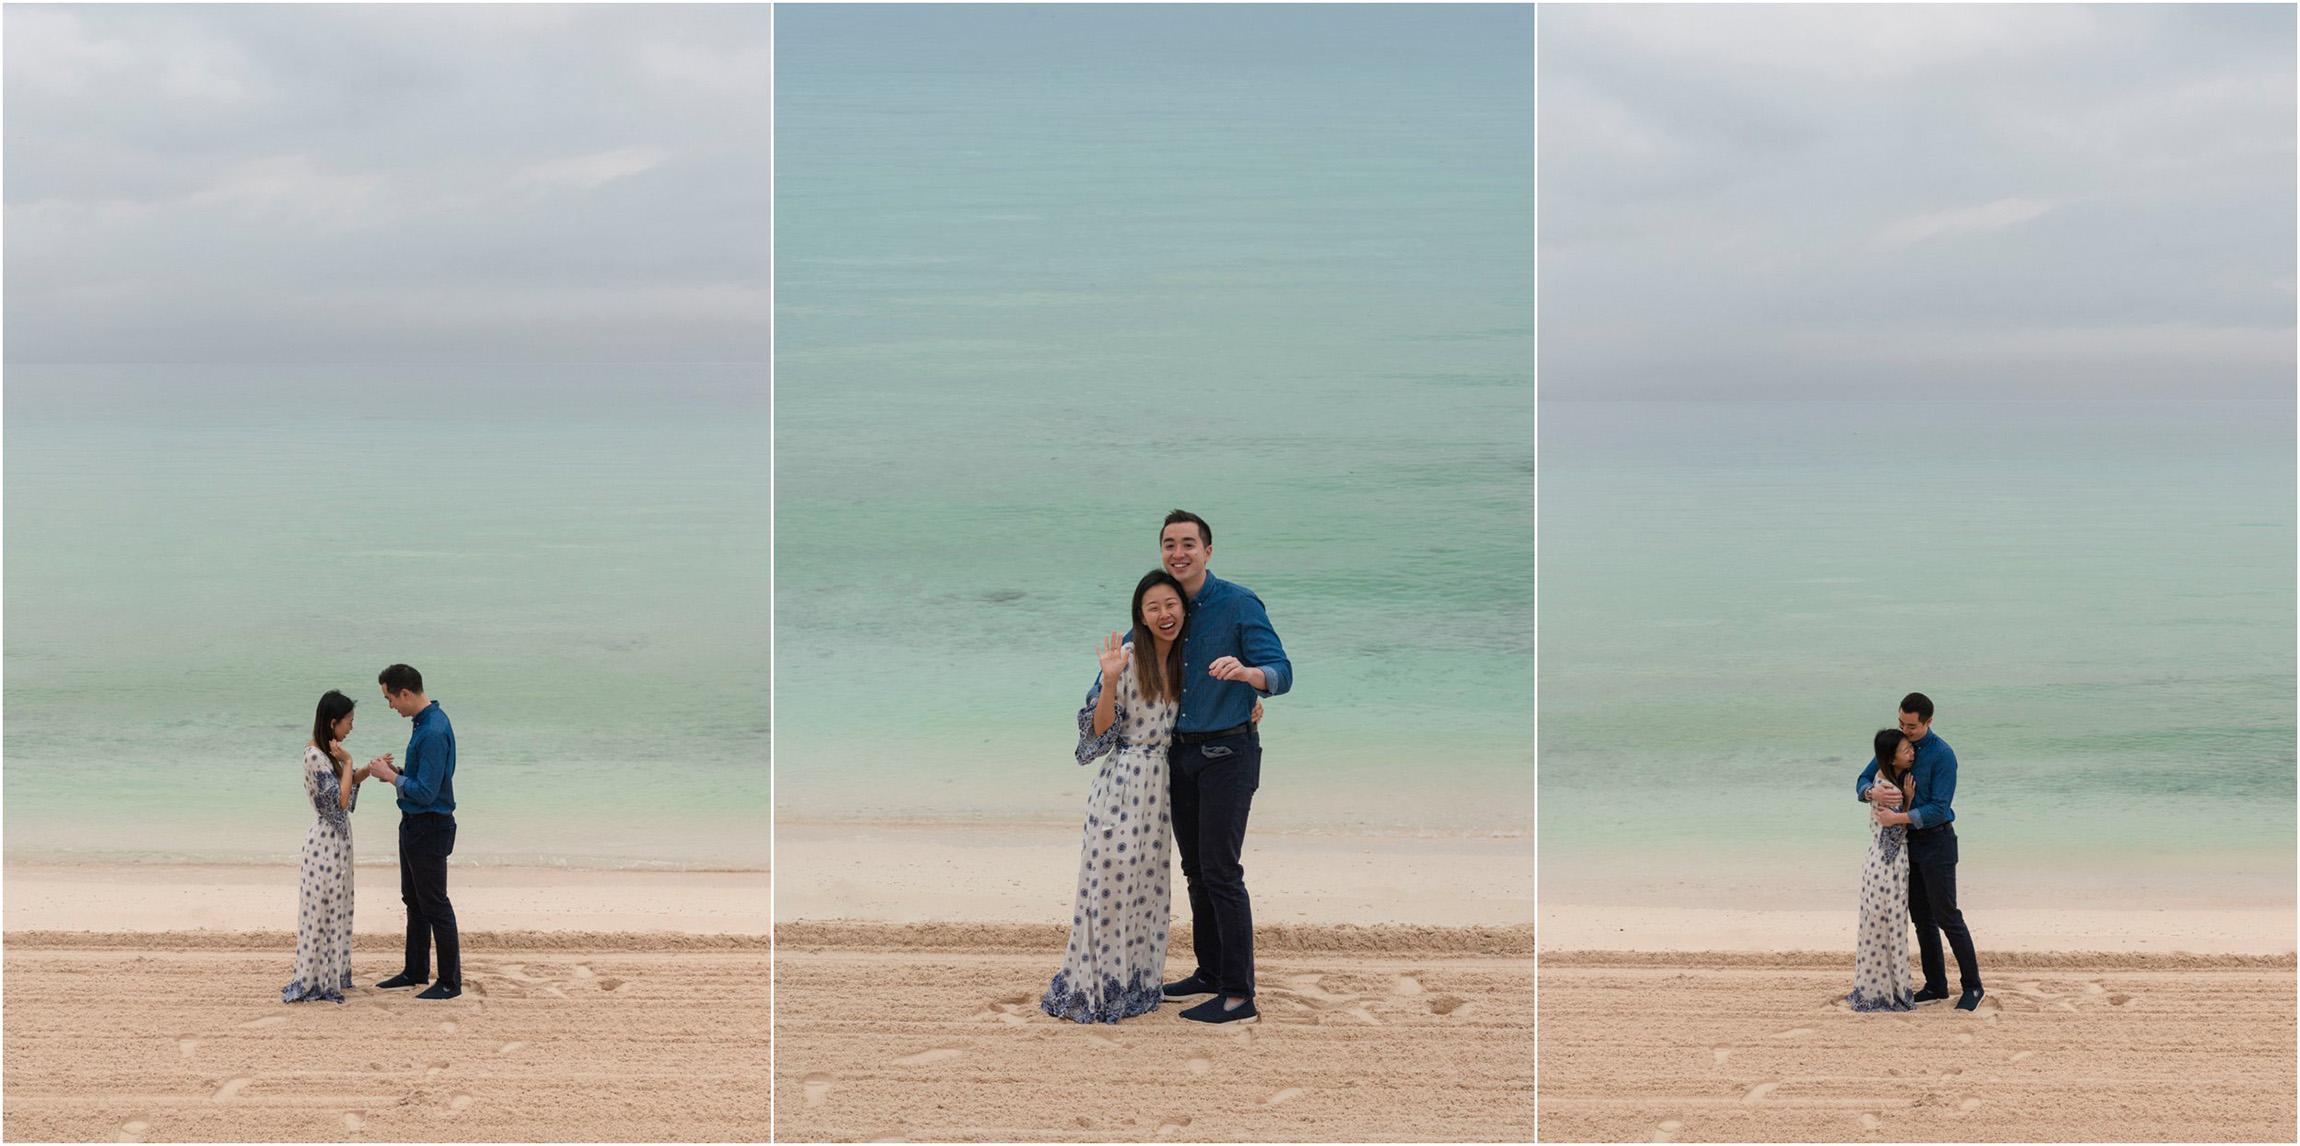 ©FianderFoto_Bermuda Proposal Photographer_Cambridge Beaches_Mason_008.jpg